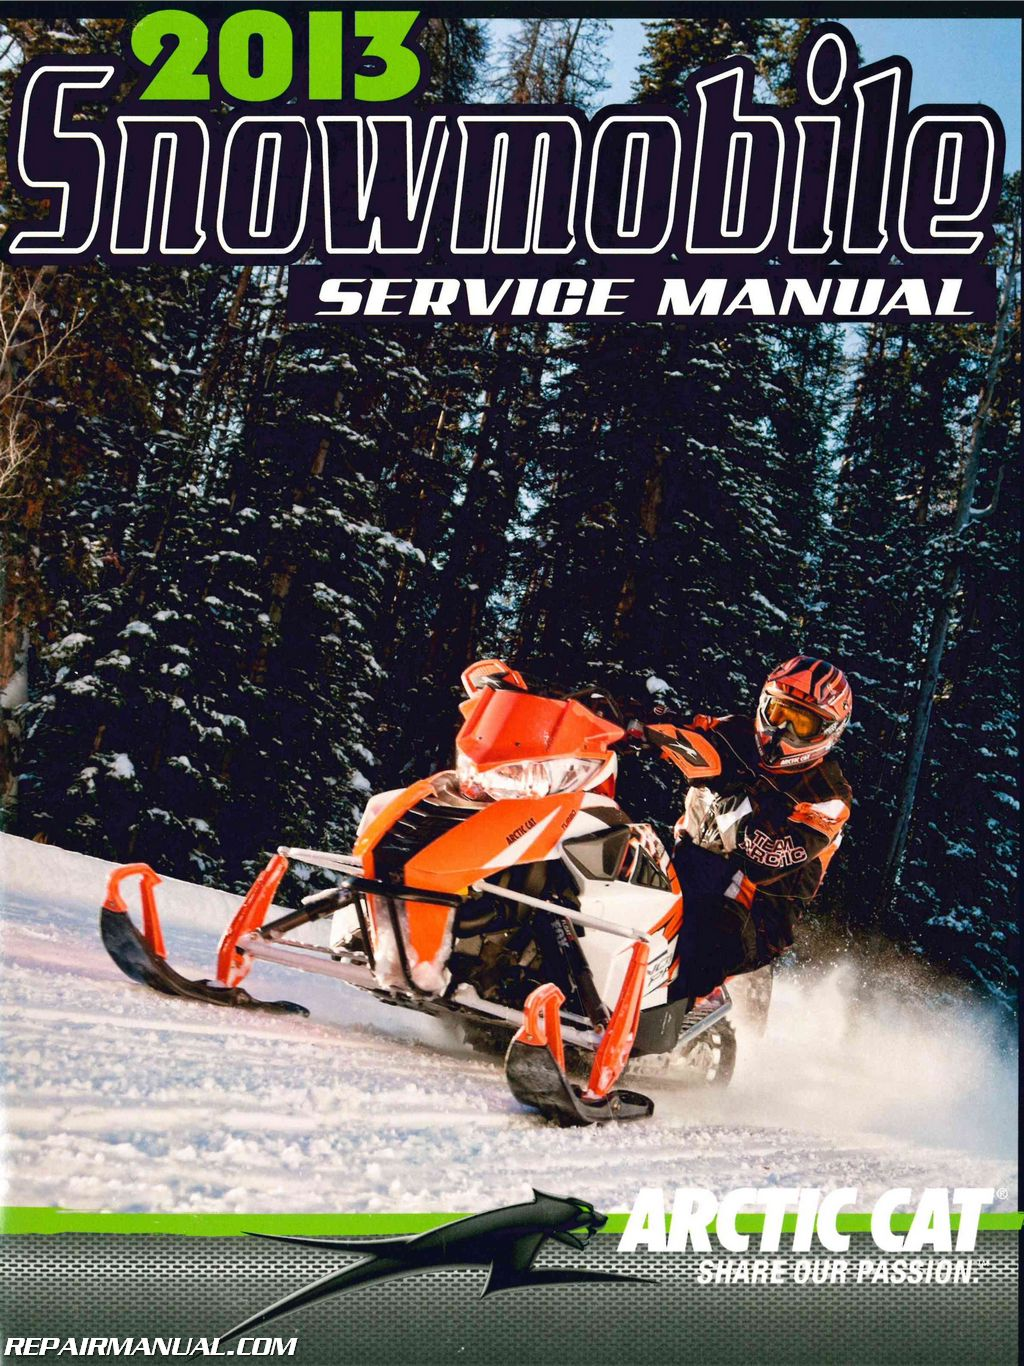 hight resolution of 2013 arctic cat snowmobile service manual jpg